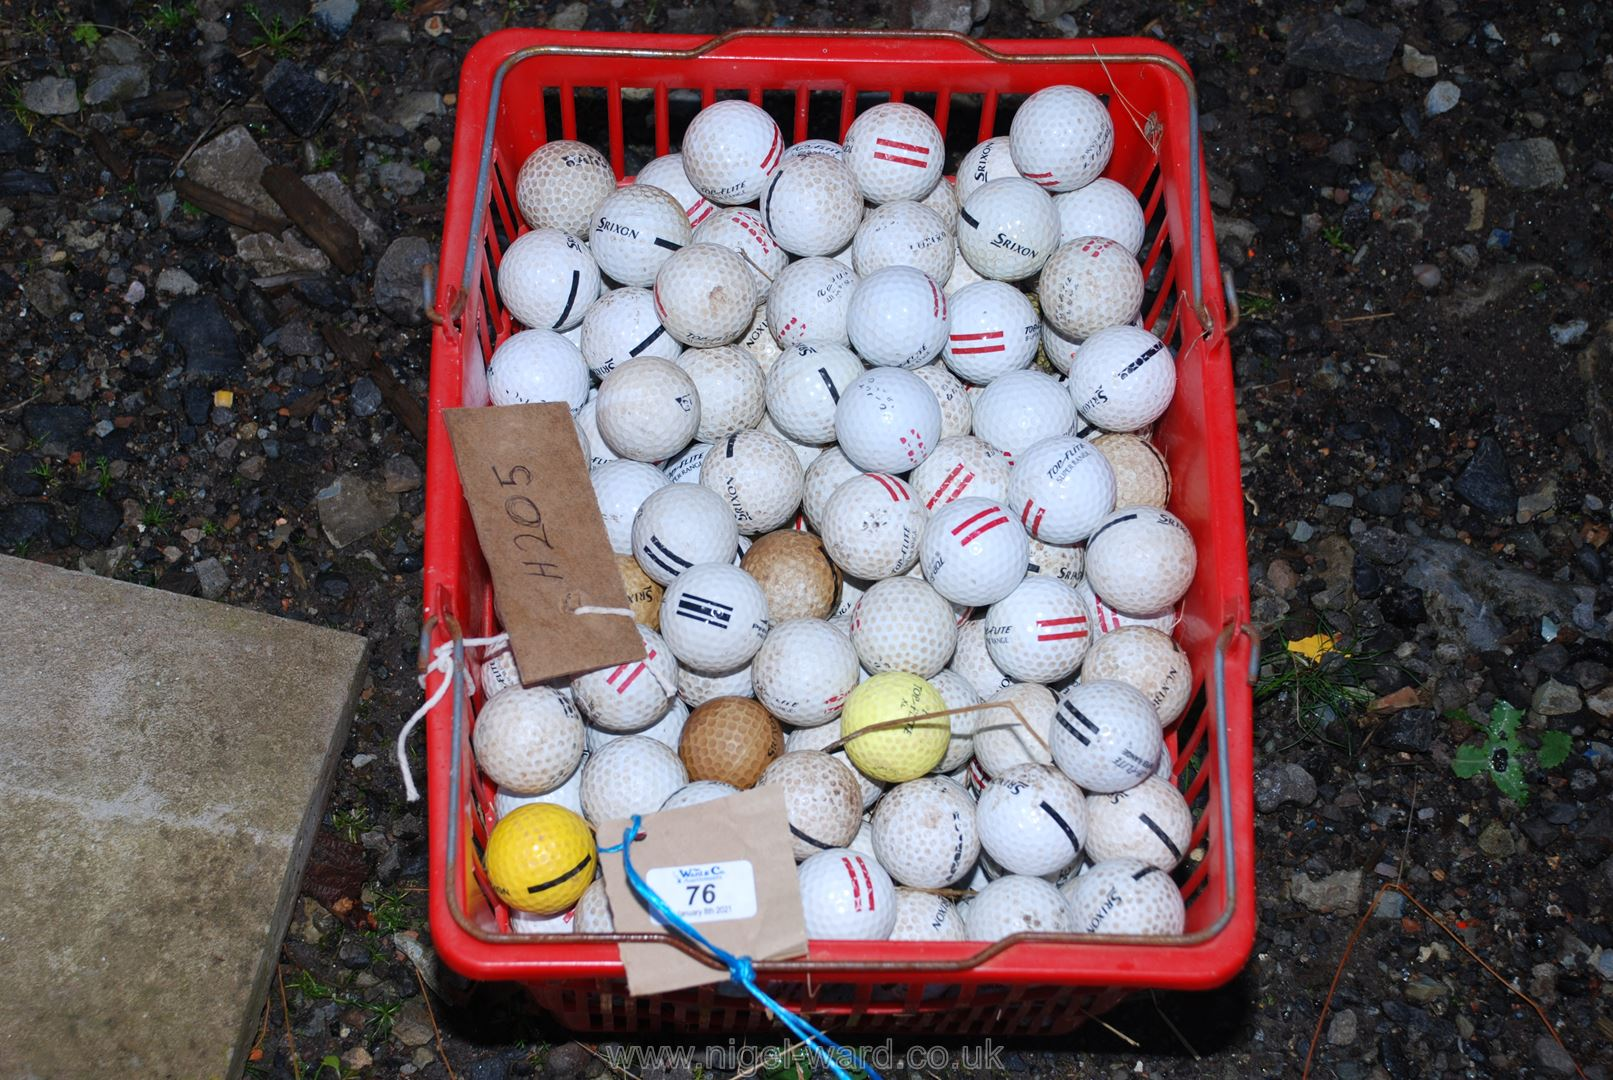 A large basket of used golf balls.